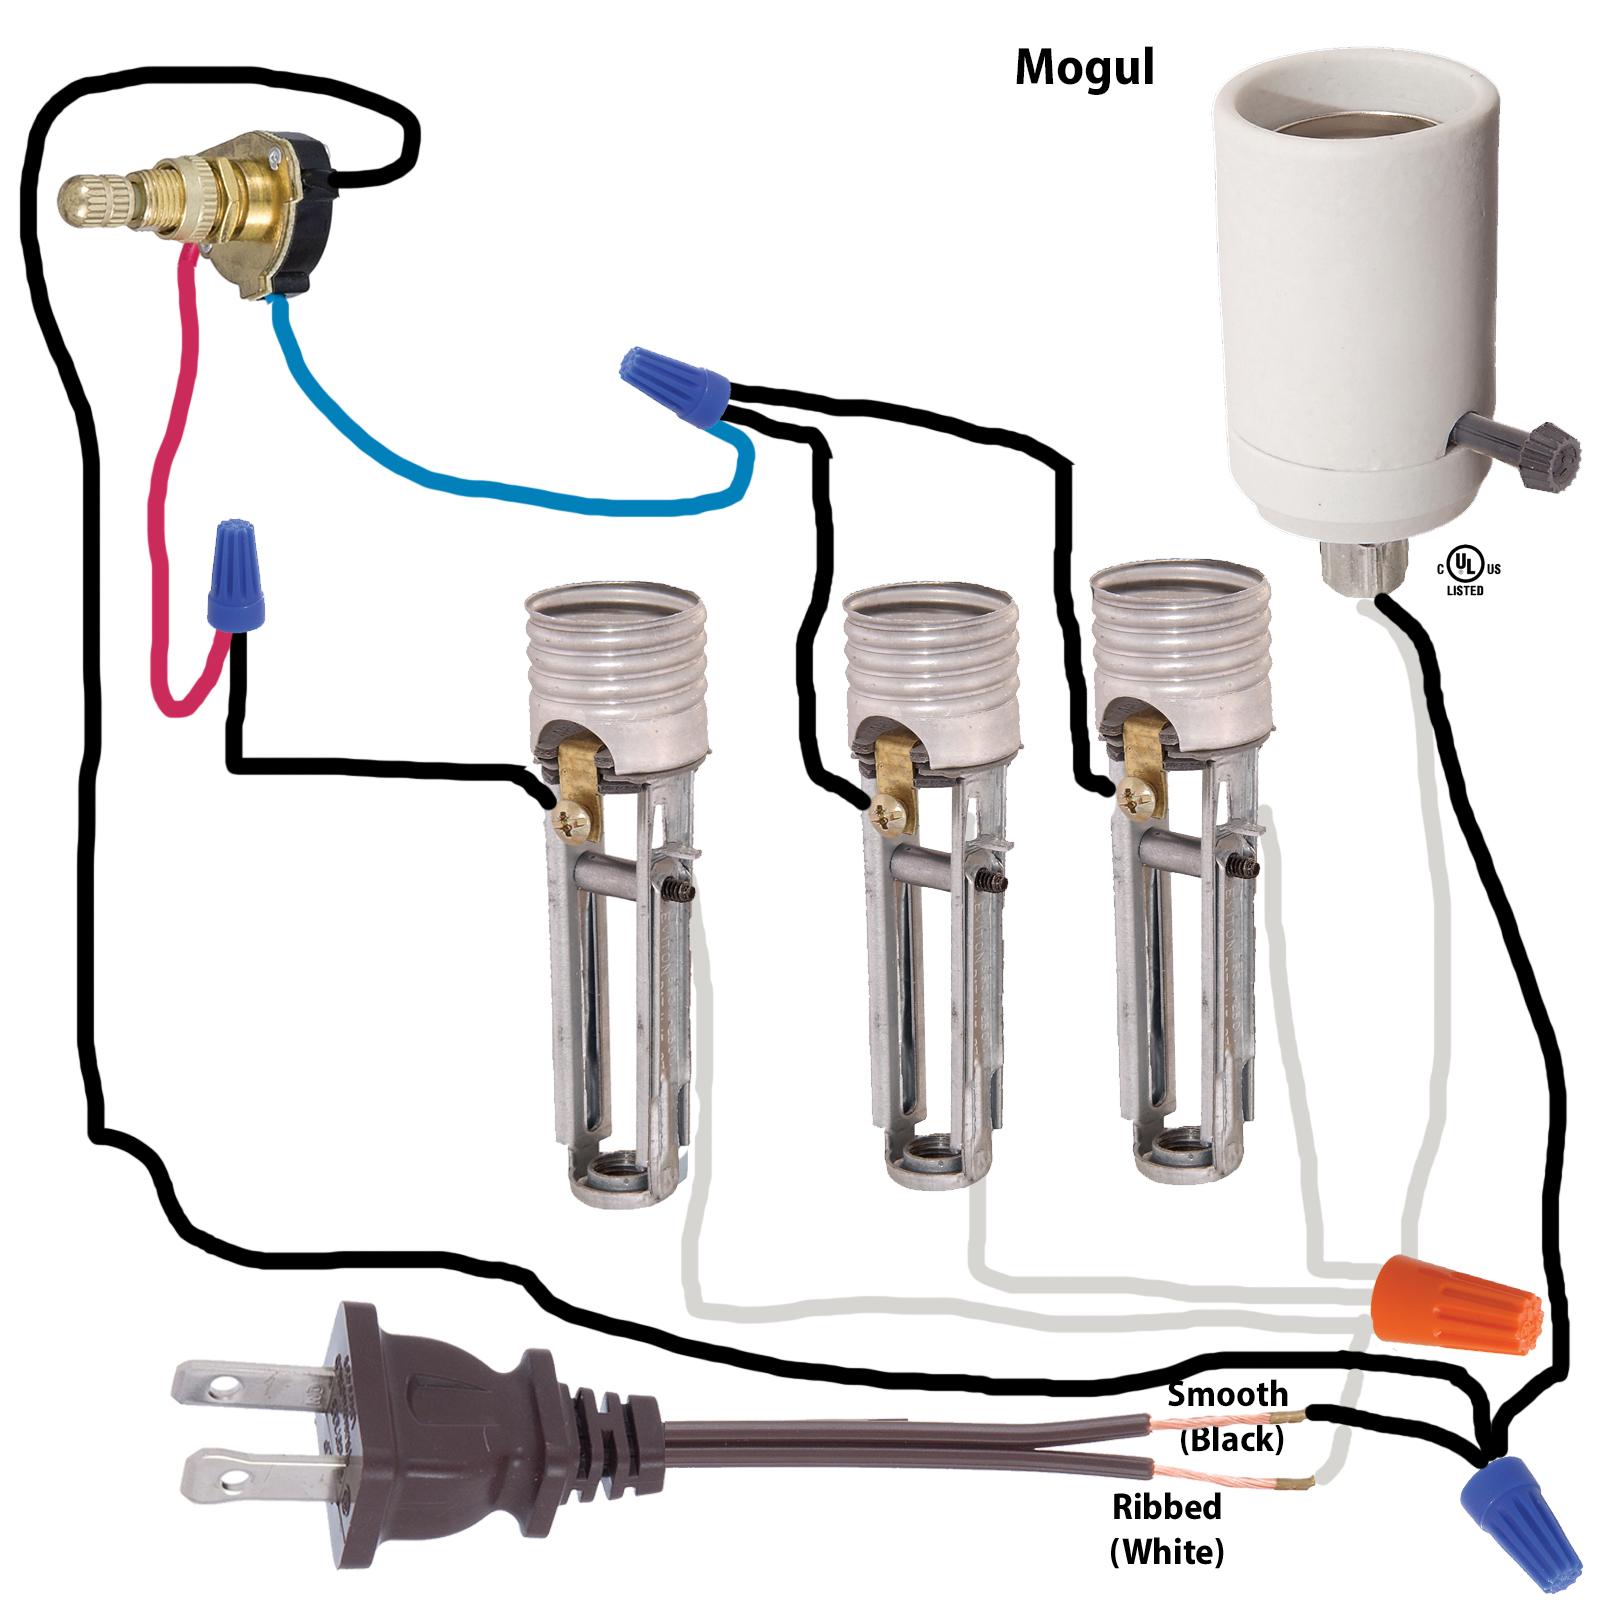 Lamp Parts and Repair | Lamp Doctor: Floor Lamp With Mogul ...